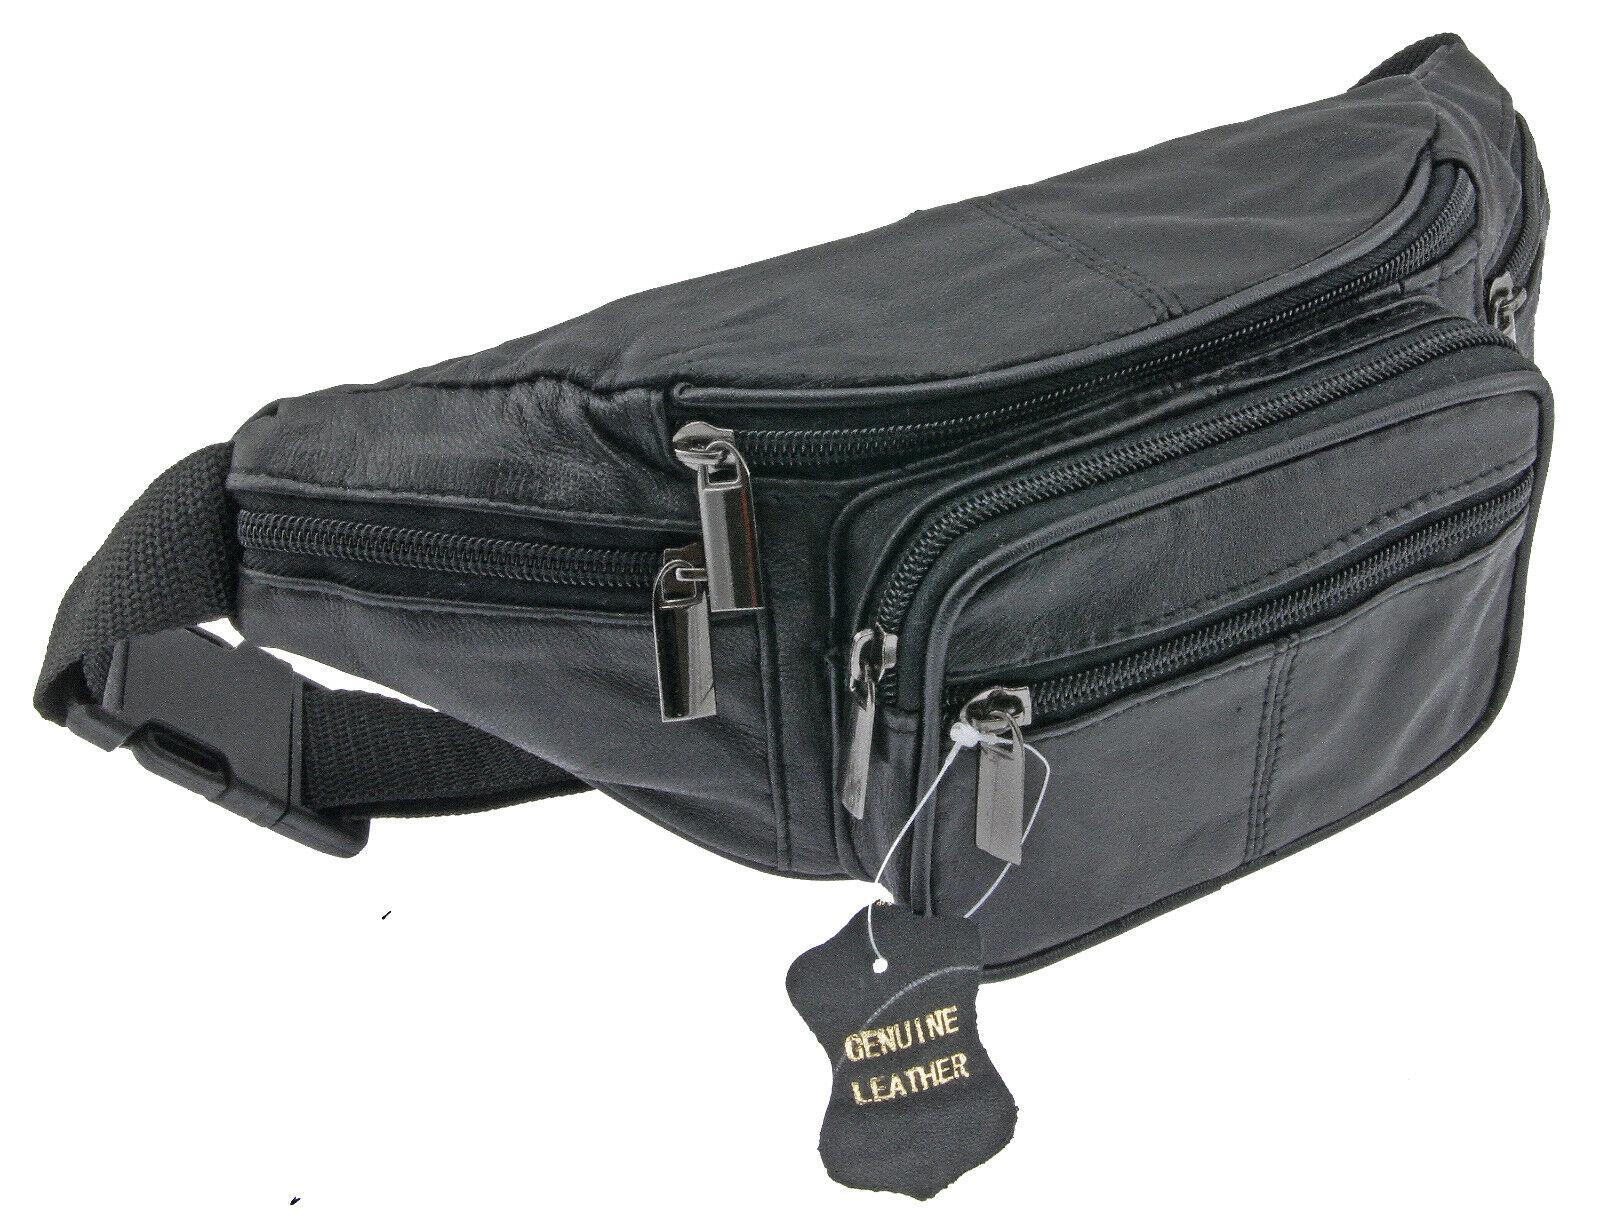 Gürteltasche Hüfttasche Bauchtasche Umhängetasche Crossbag - Echt Leder! LK568